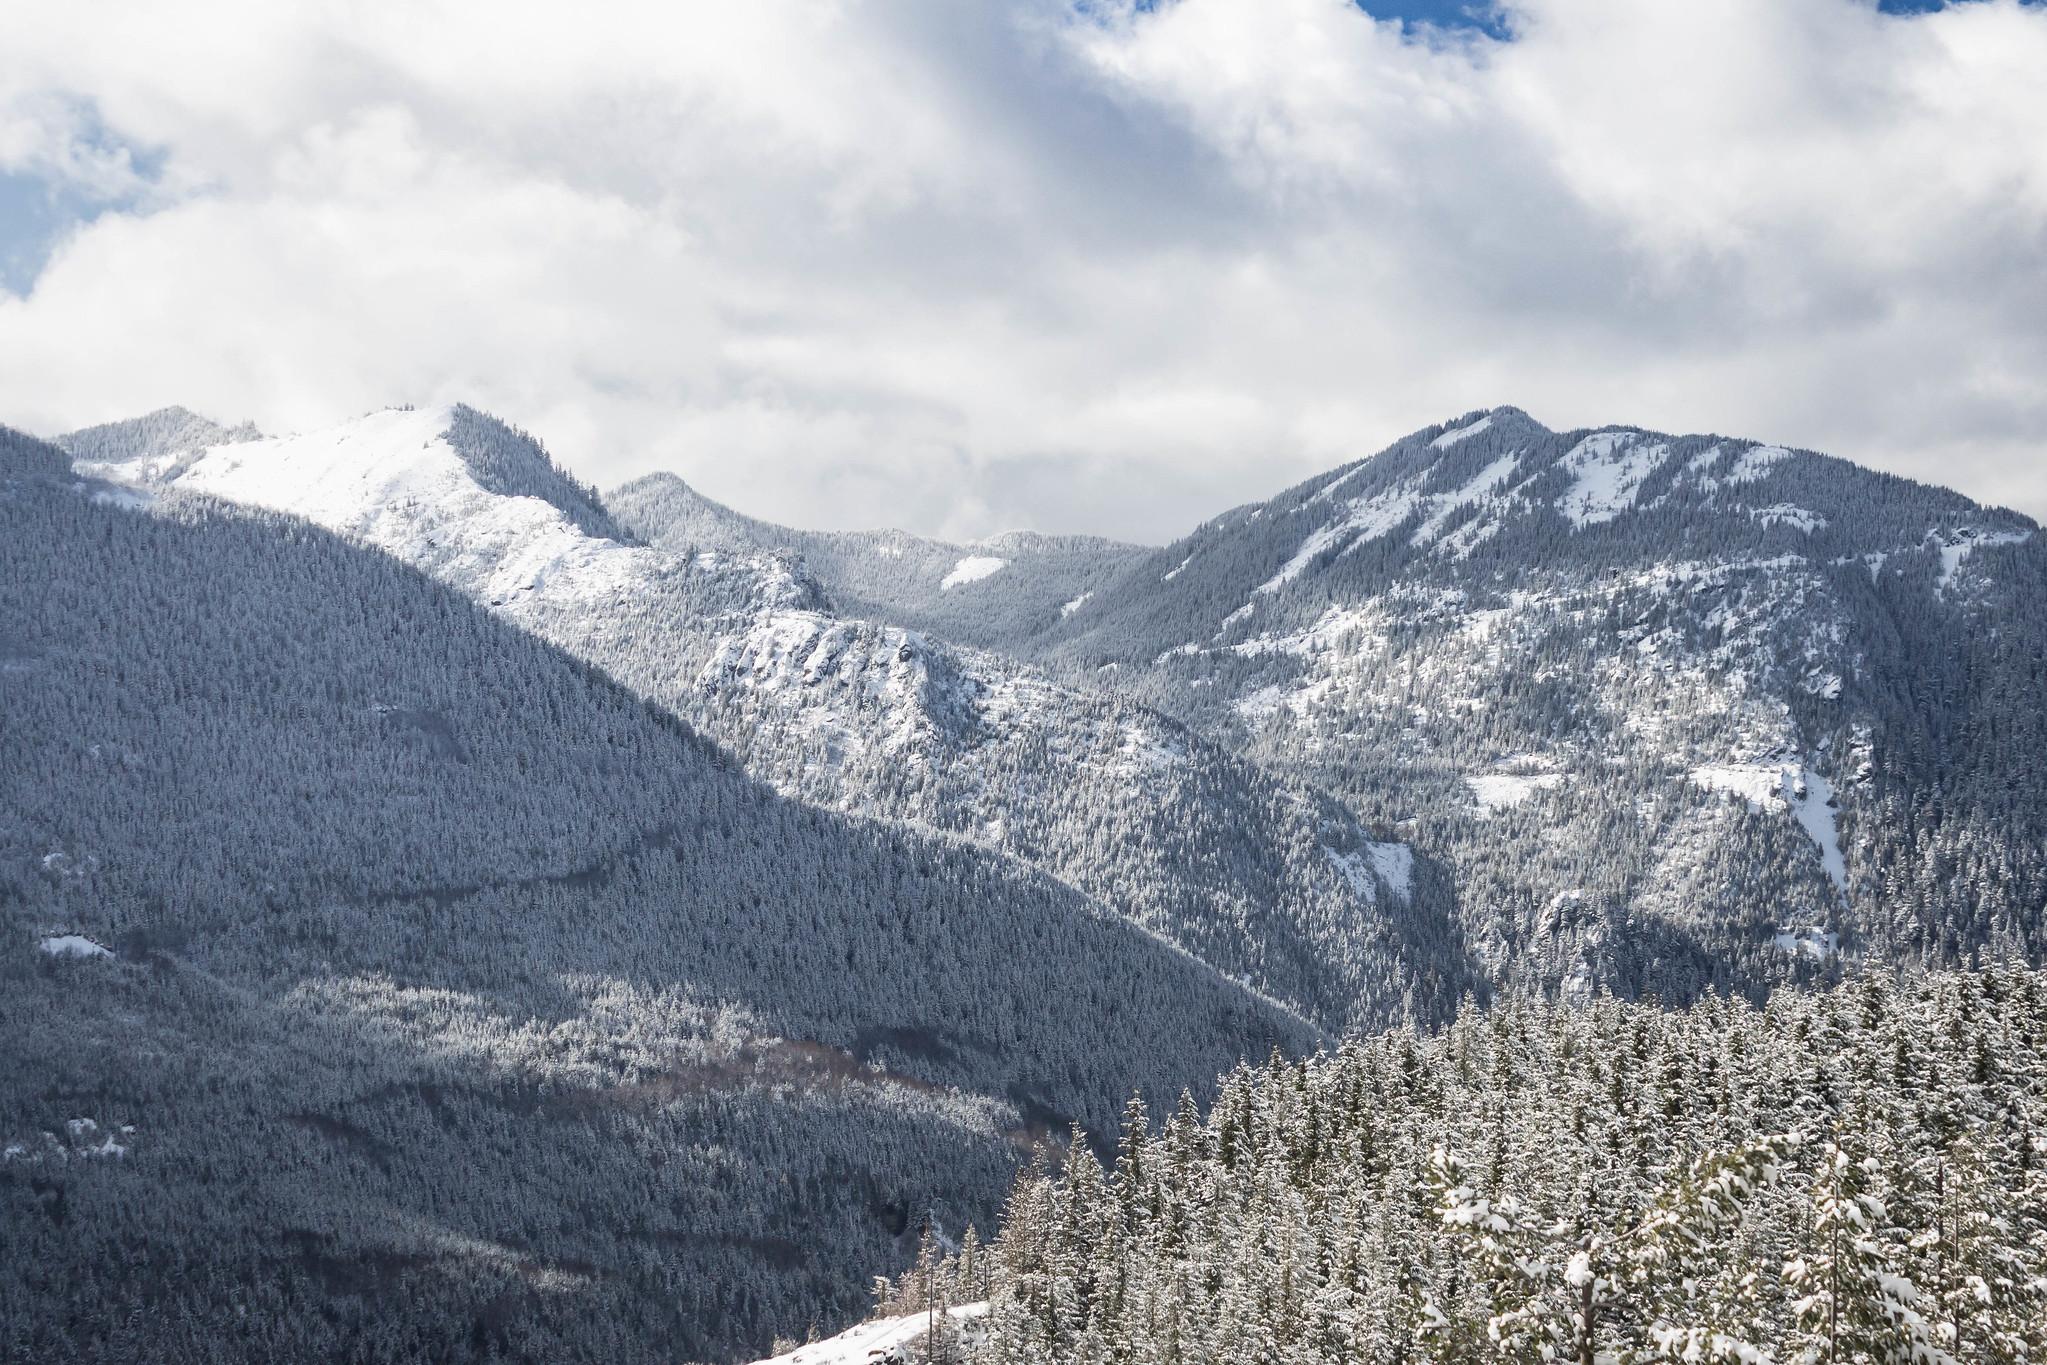 Change Peak and Mount Washington